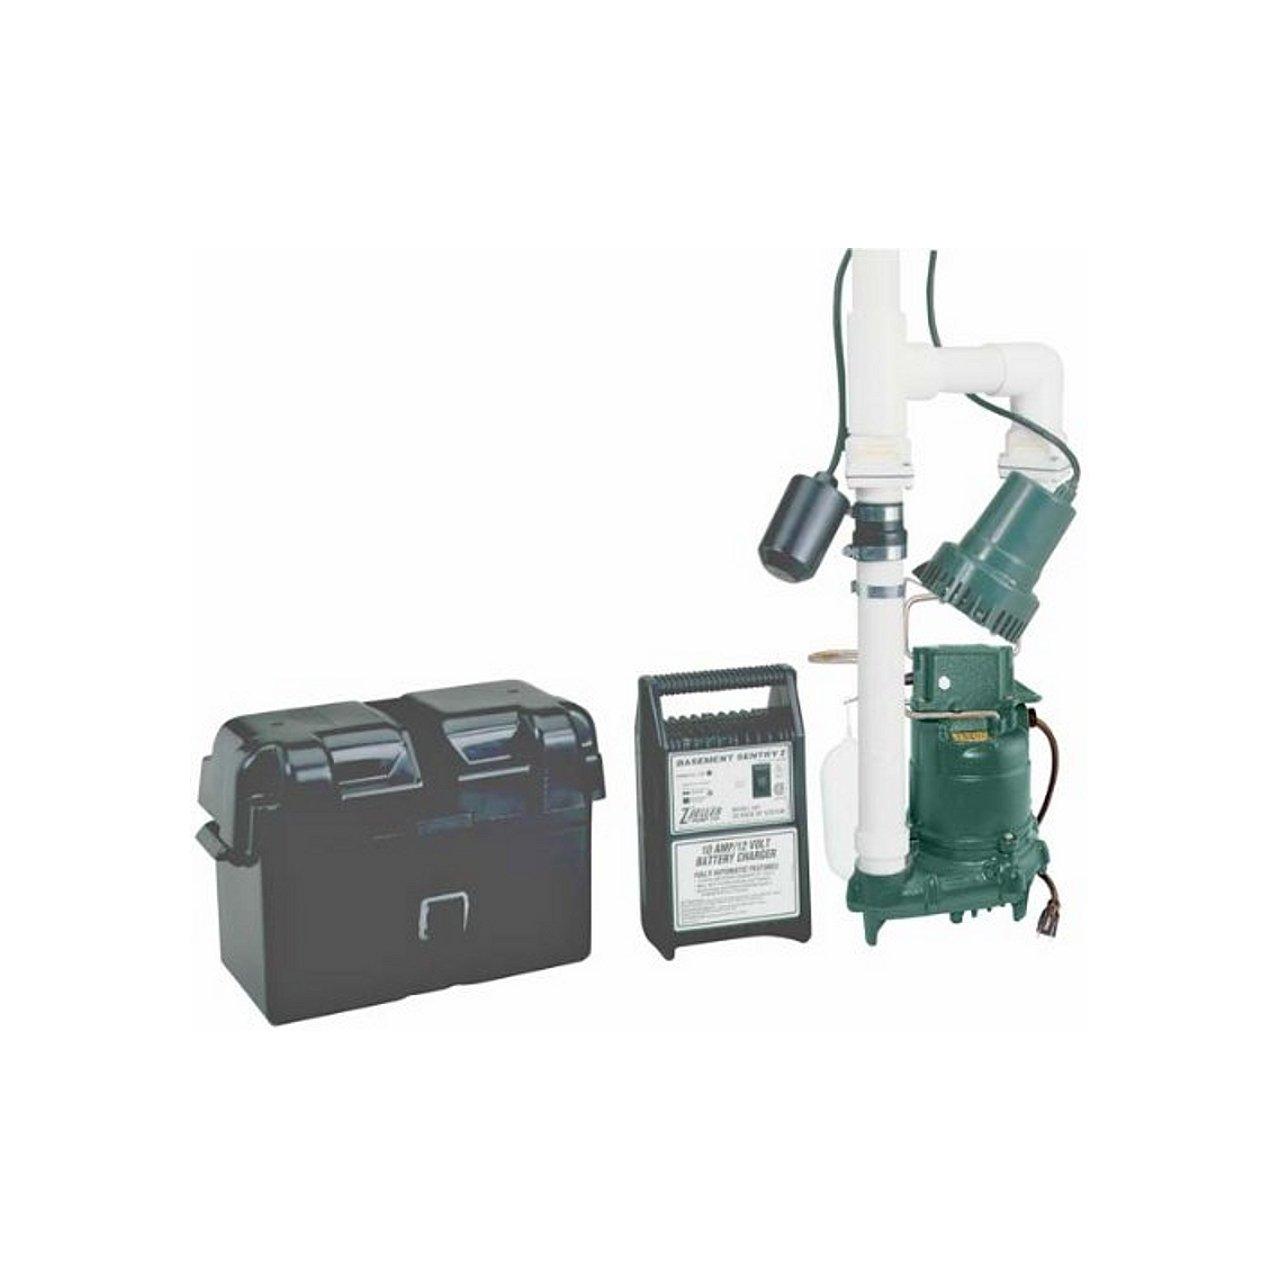 Zoeller 507 0005 Zoeller 507 0005 Basement Sentry Battery Backup Pump